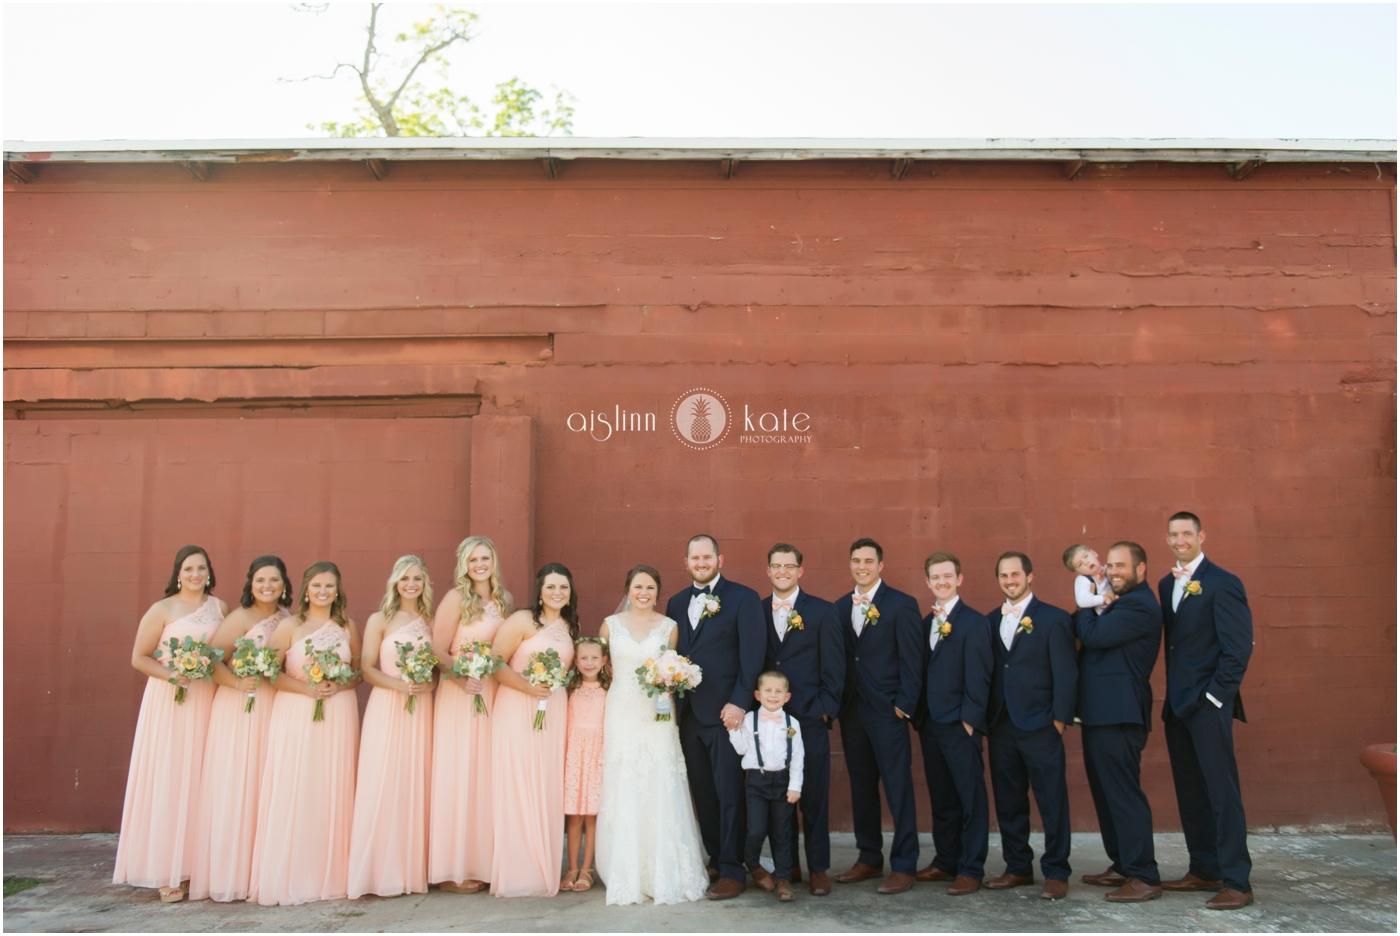 Pensacola-Destin-Wedding-Photographer_6210.jpg